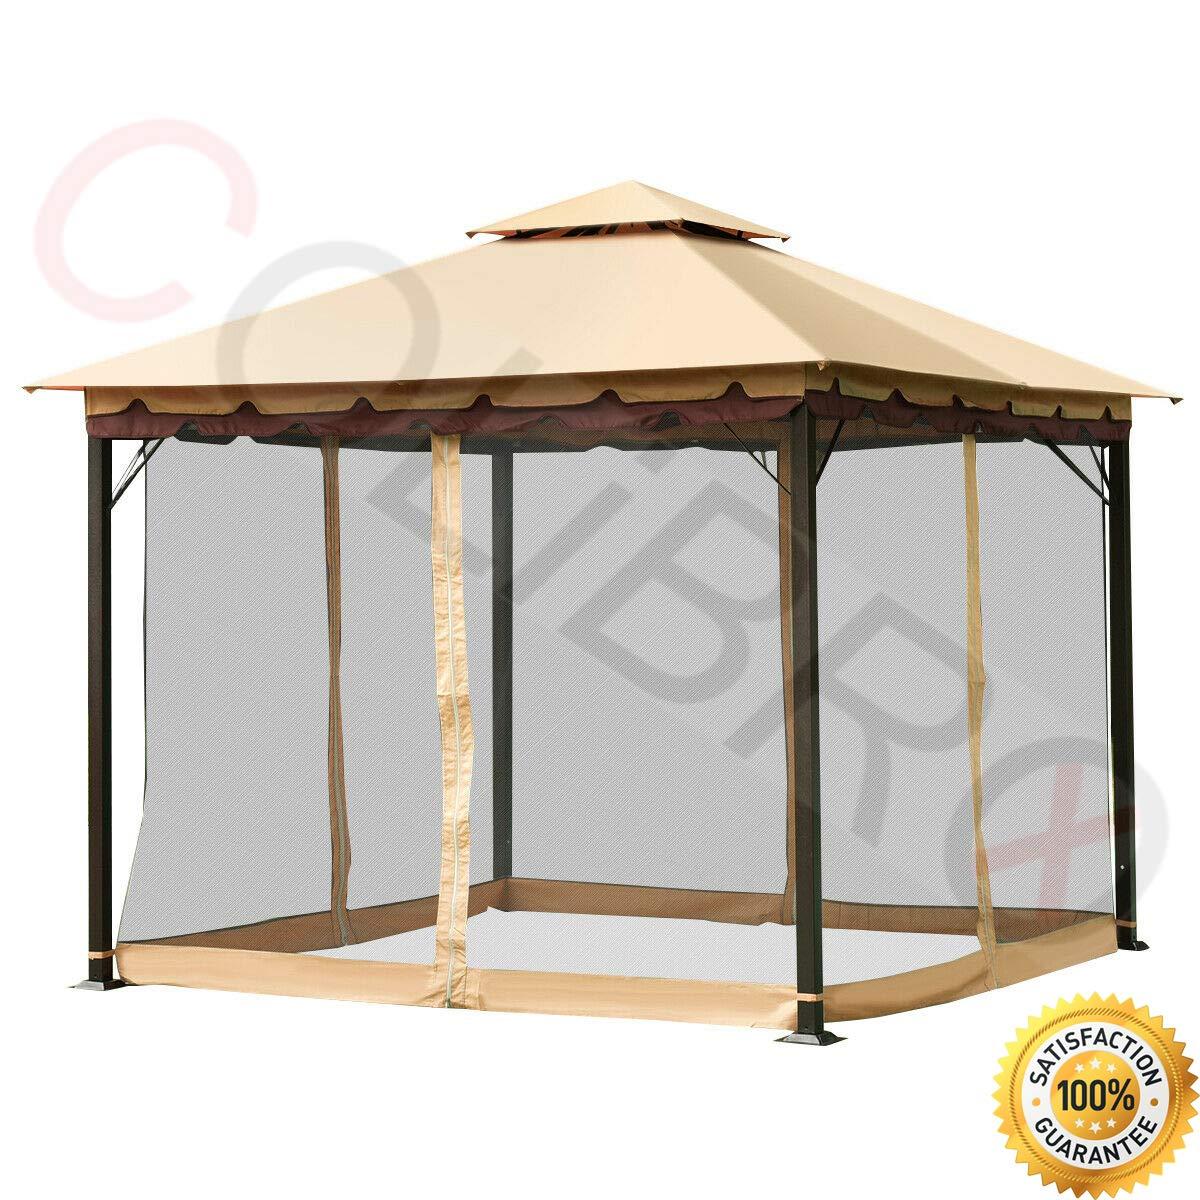 COLIBROX-TM 2-Tier 10'x10′ Gazebo Canopy Tent Shelter Awning Steel Patio Garden Outdoor Event Pavilion Garden Lawn Backyard Camping Tent Elegant Design